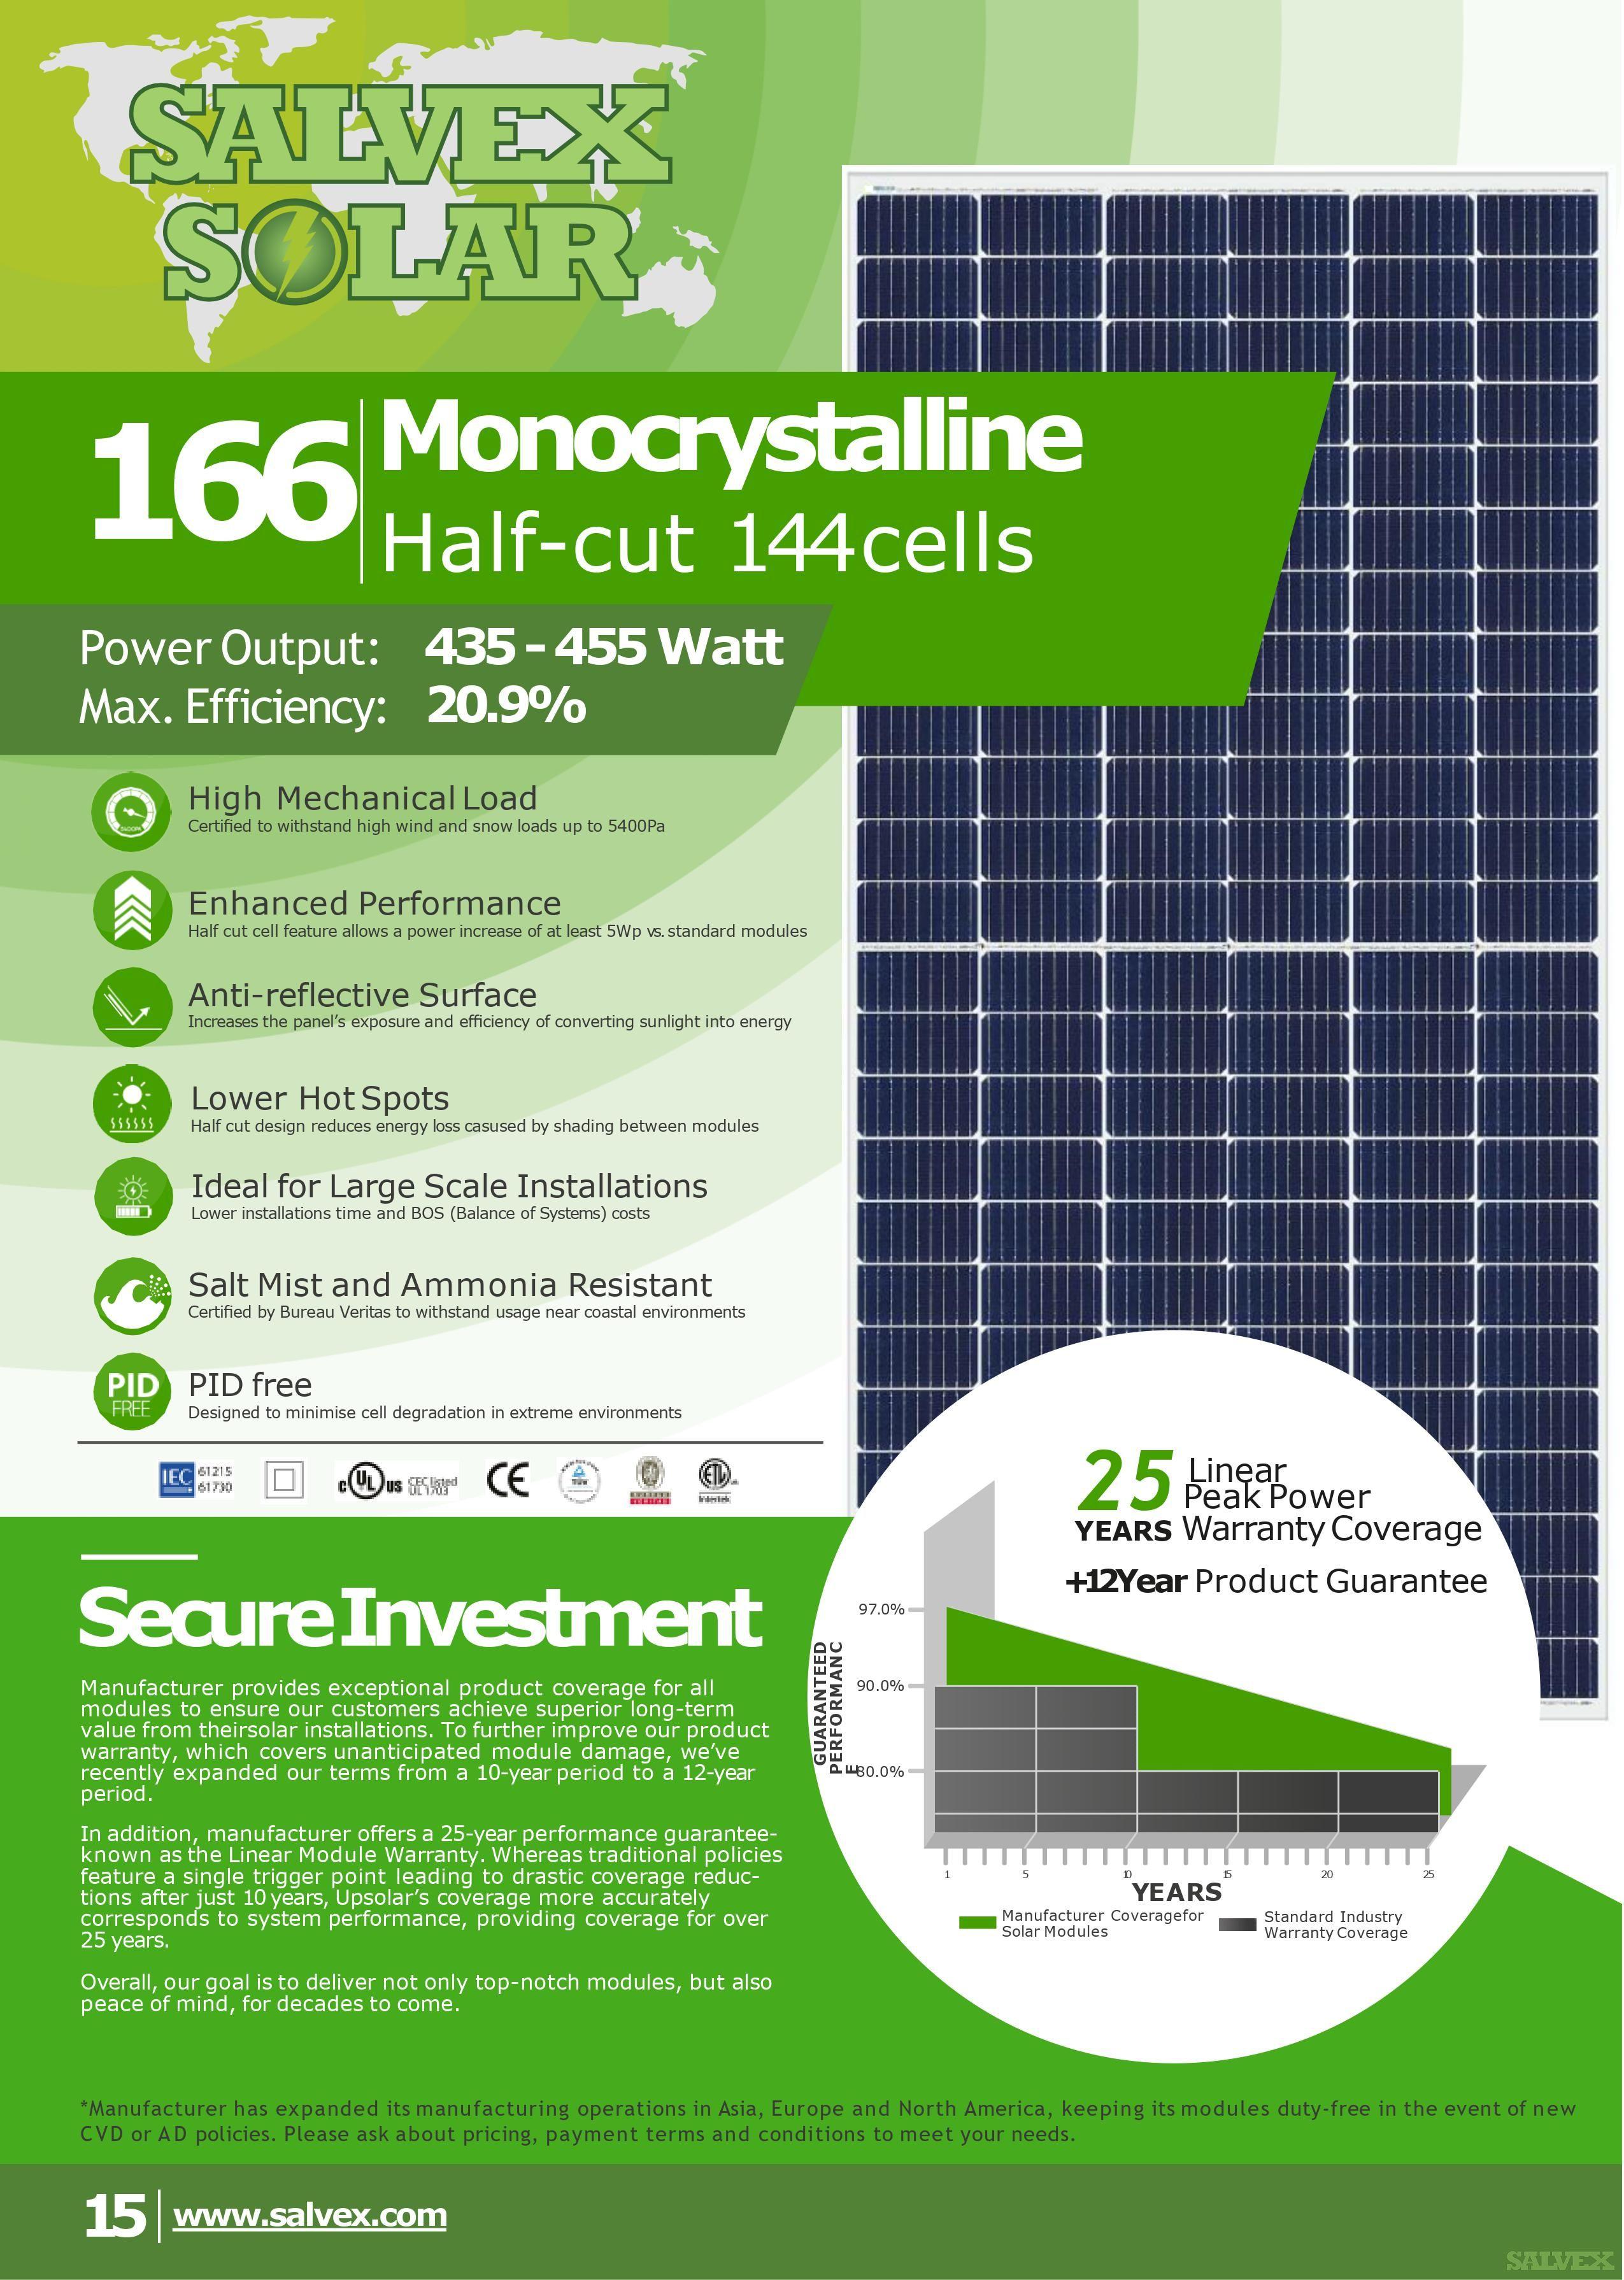 Salvex Solar 450W Monocrystalline PV Solar Panels (Minimum Order: 1 x 40HQ Container)